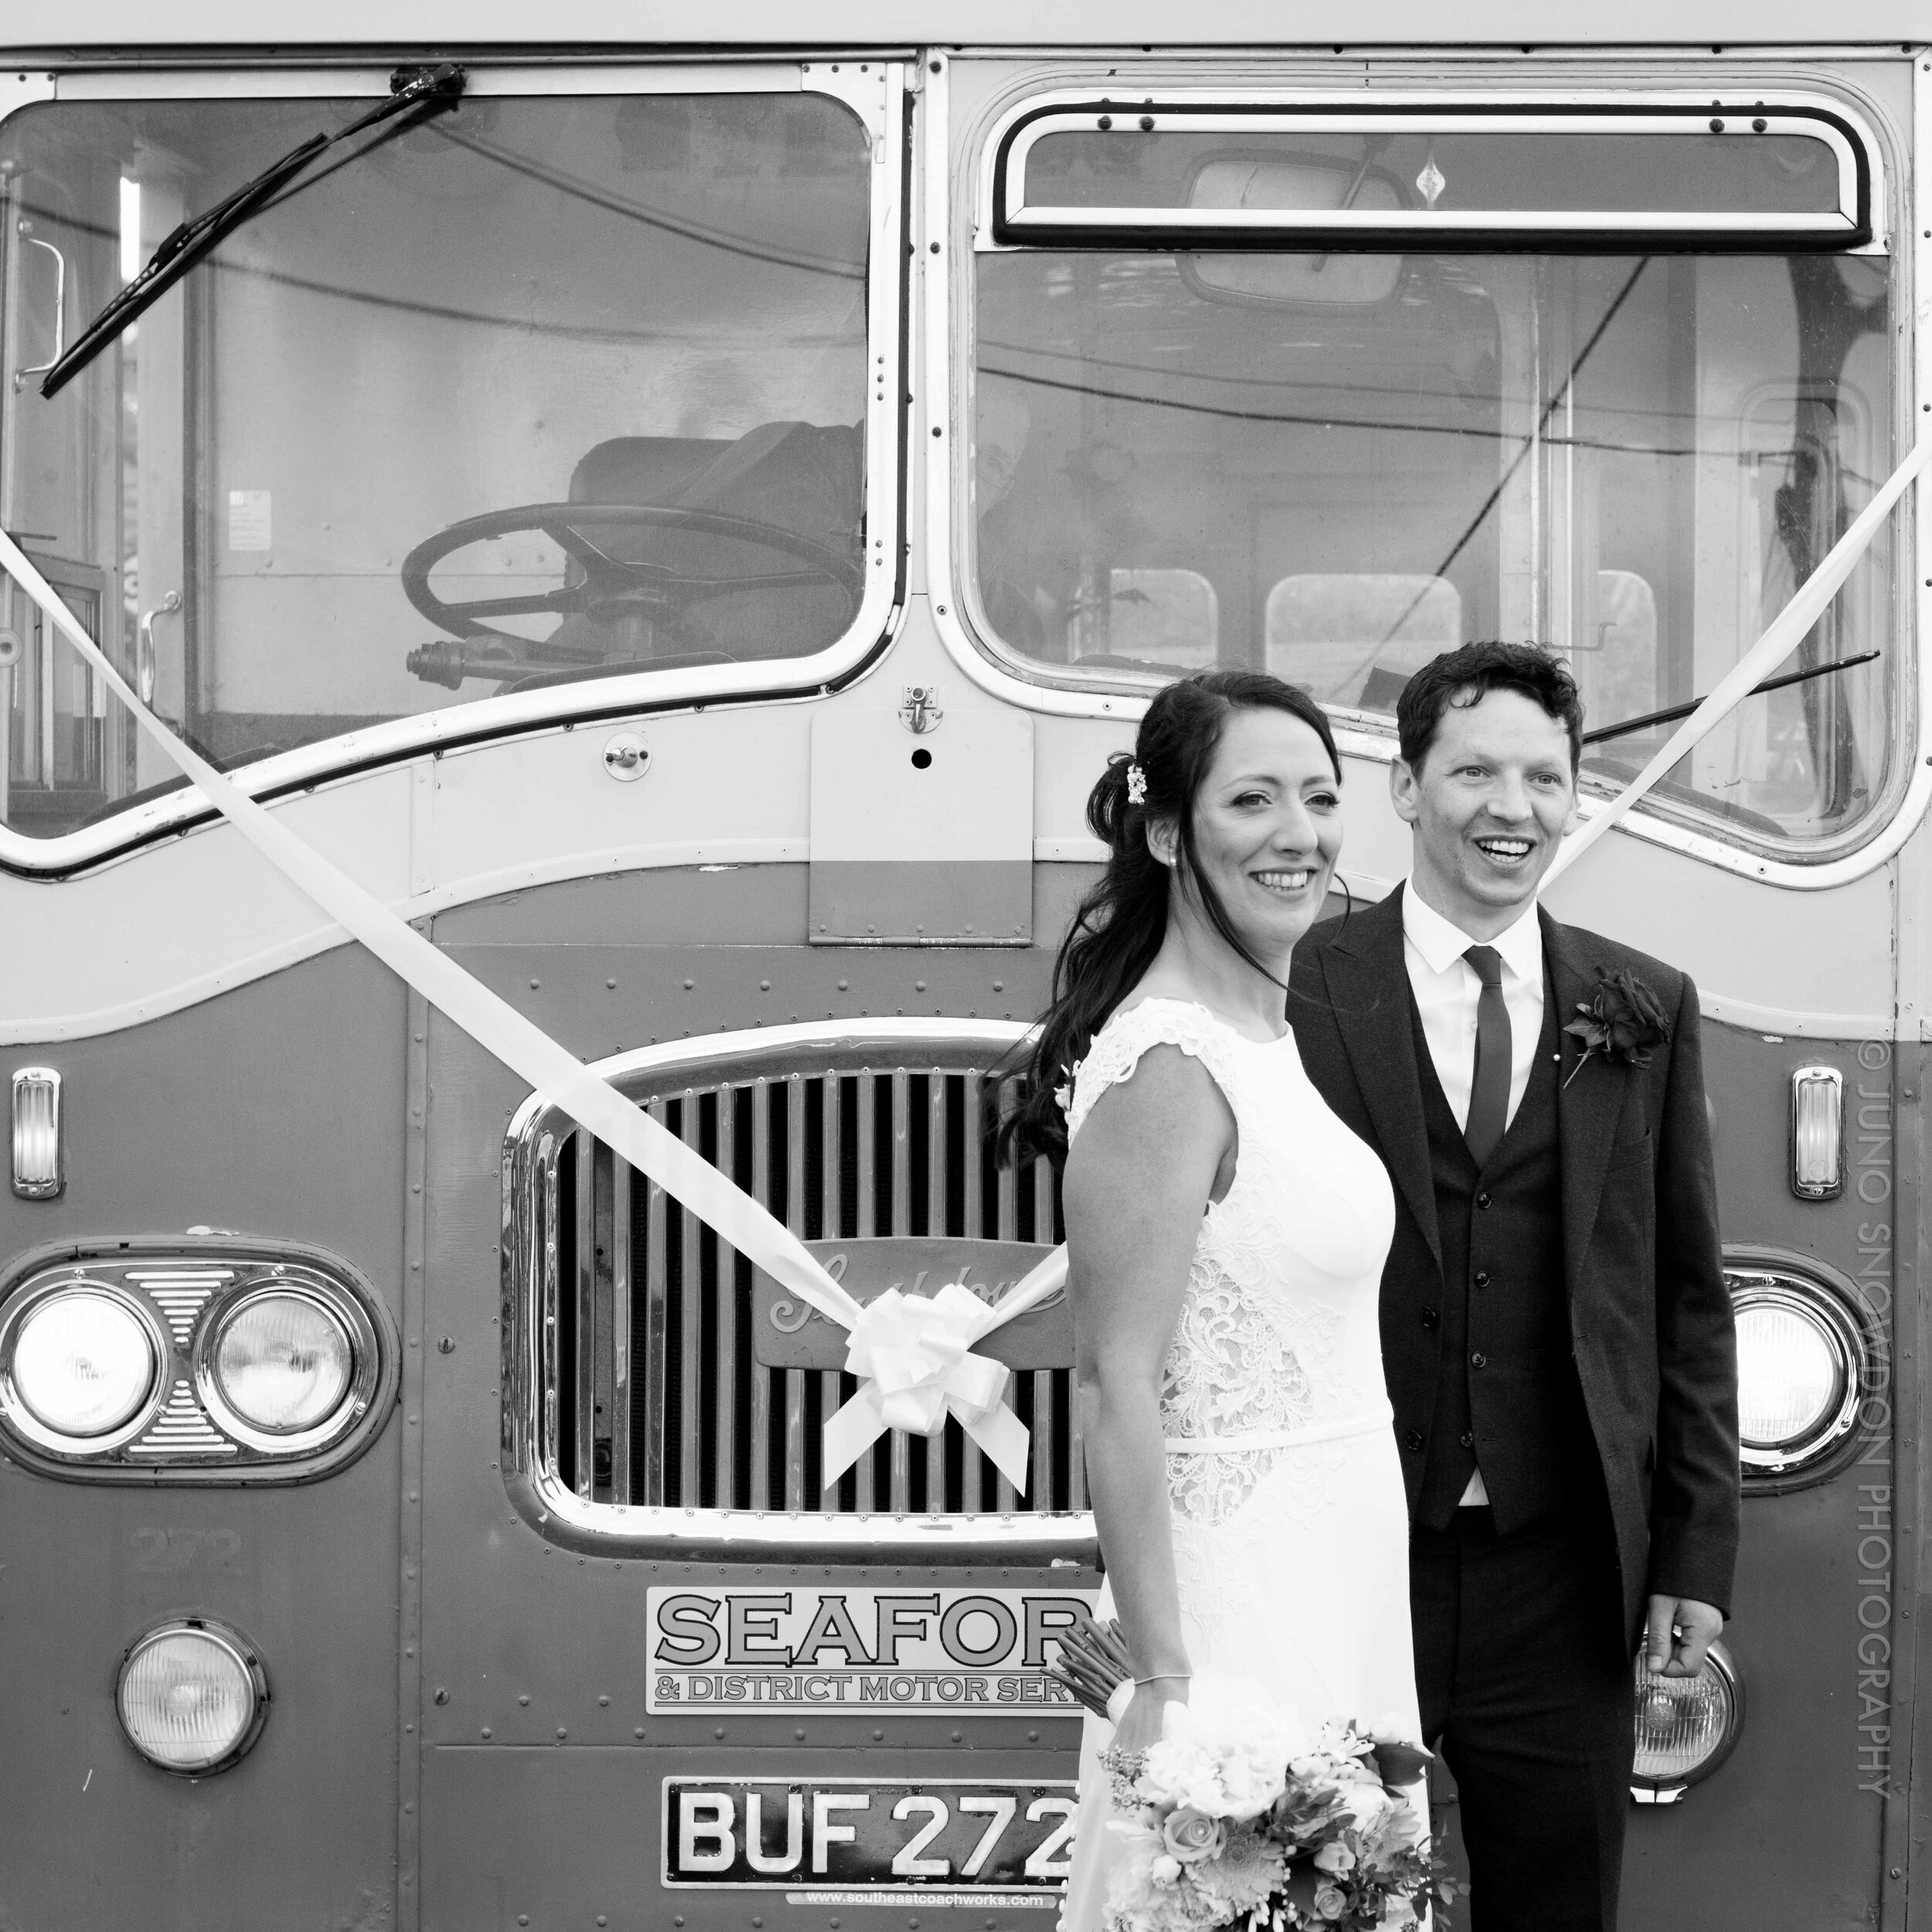 juno-snowdon-photography-wedding-7882.jpg